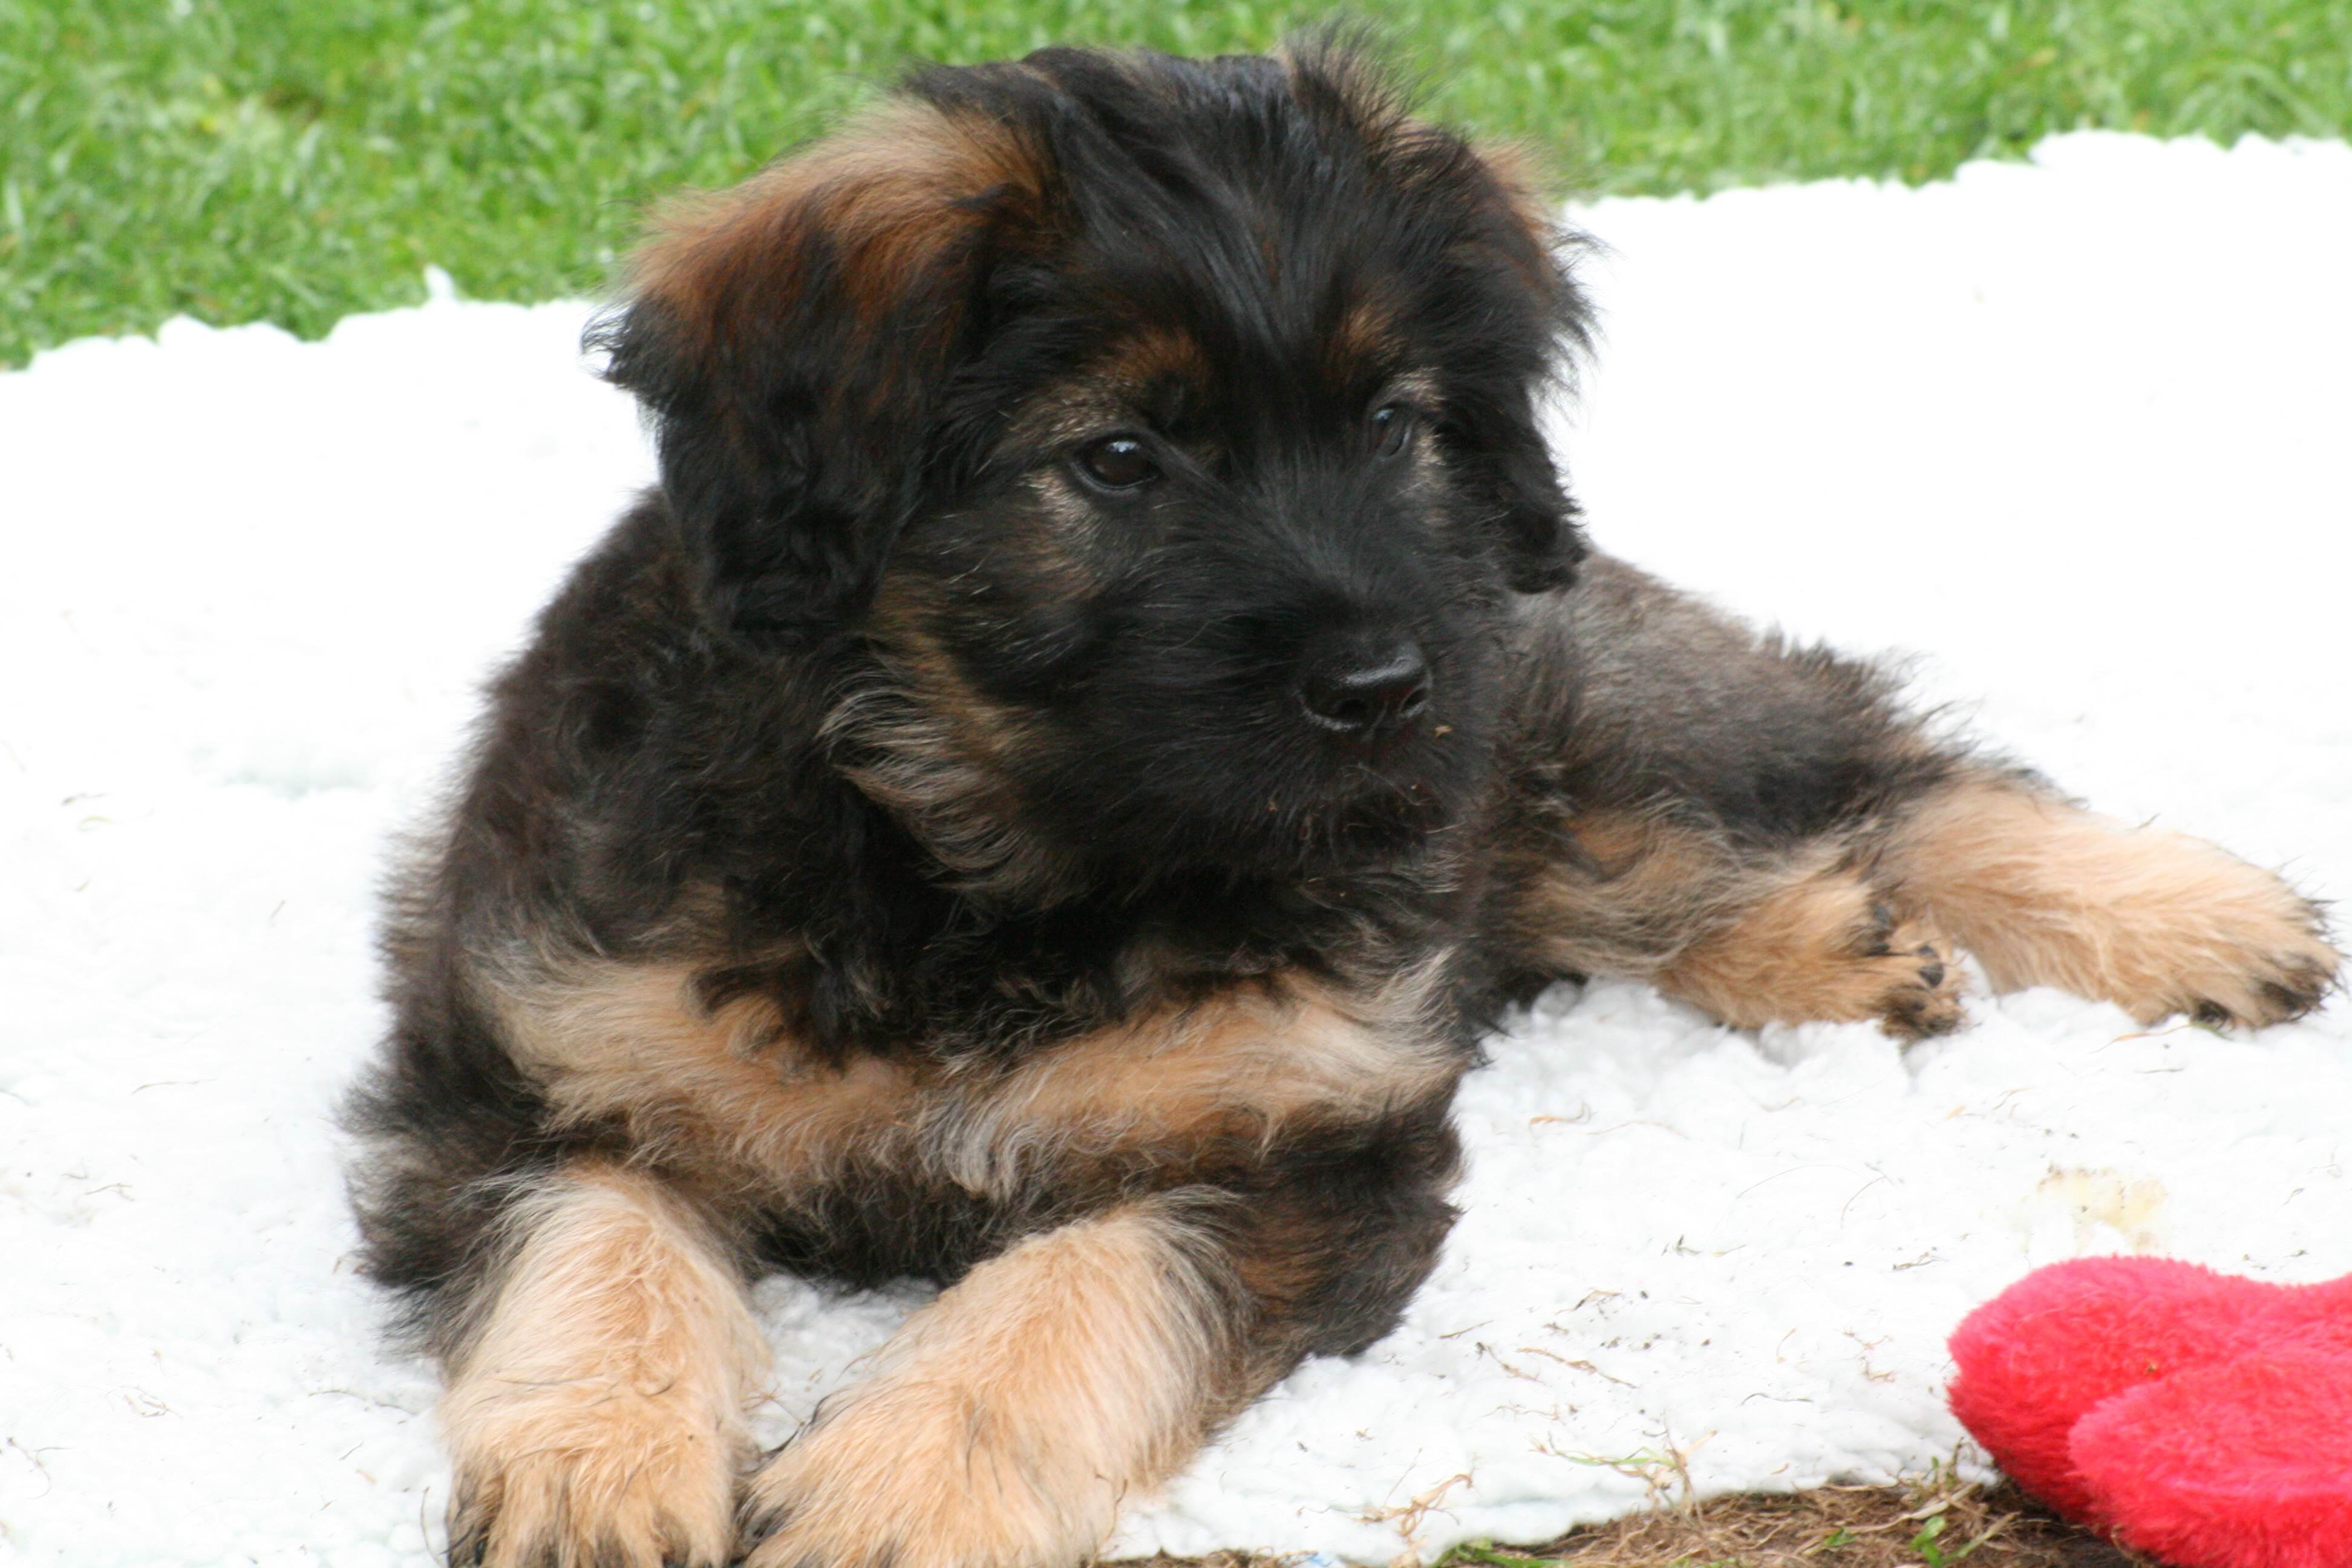 Basina as puppy